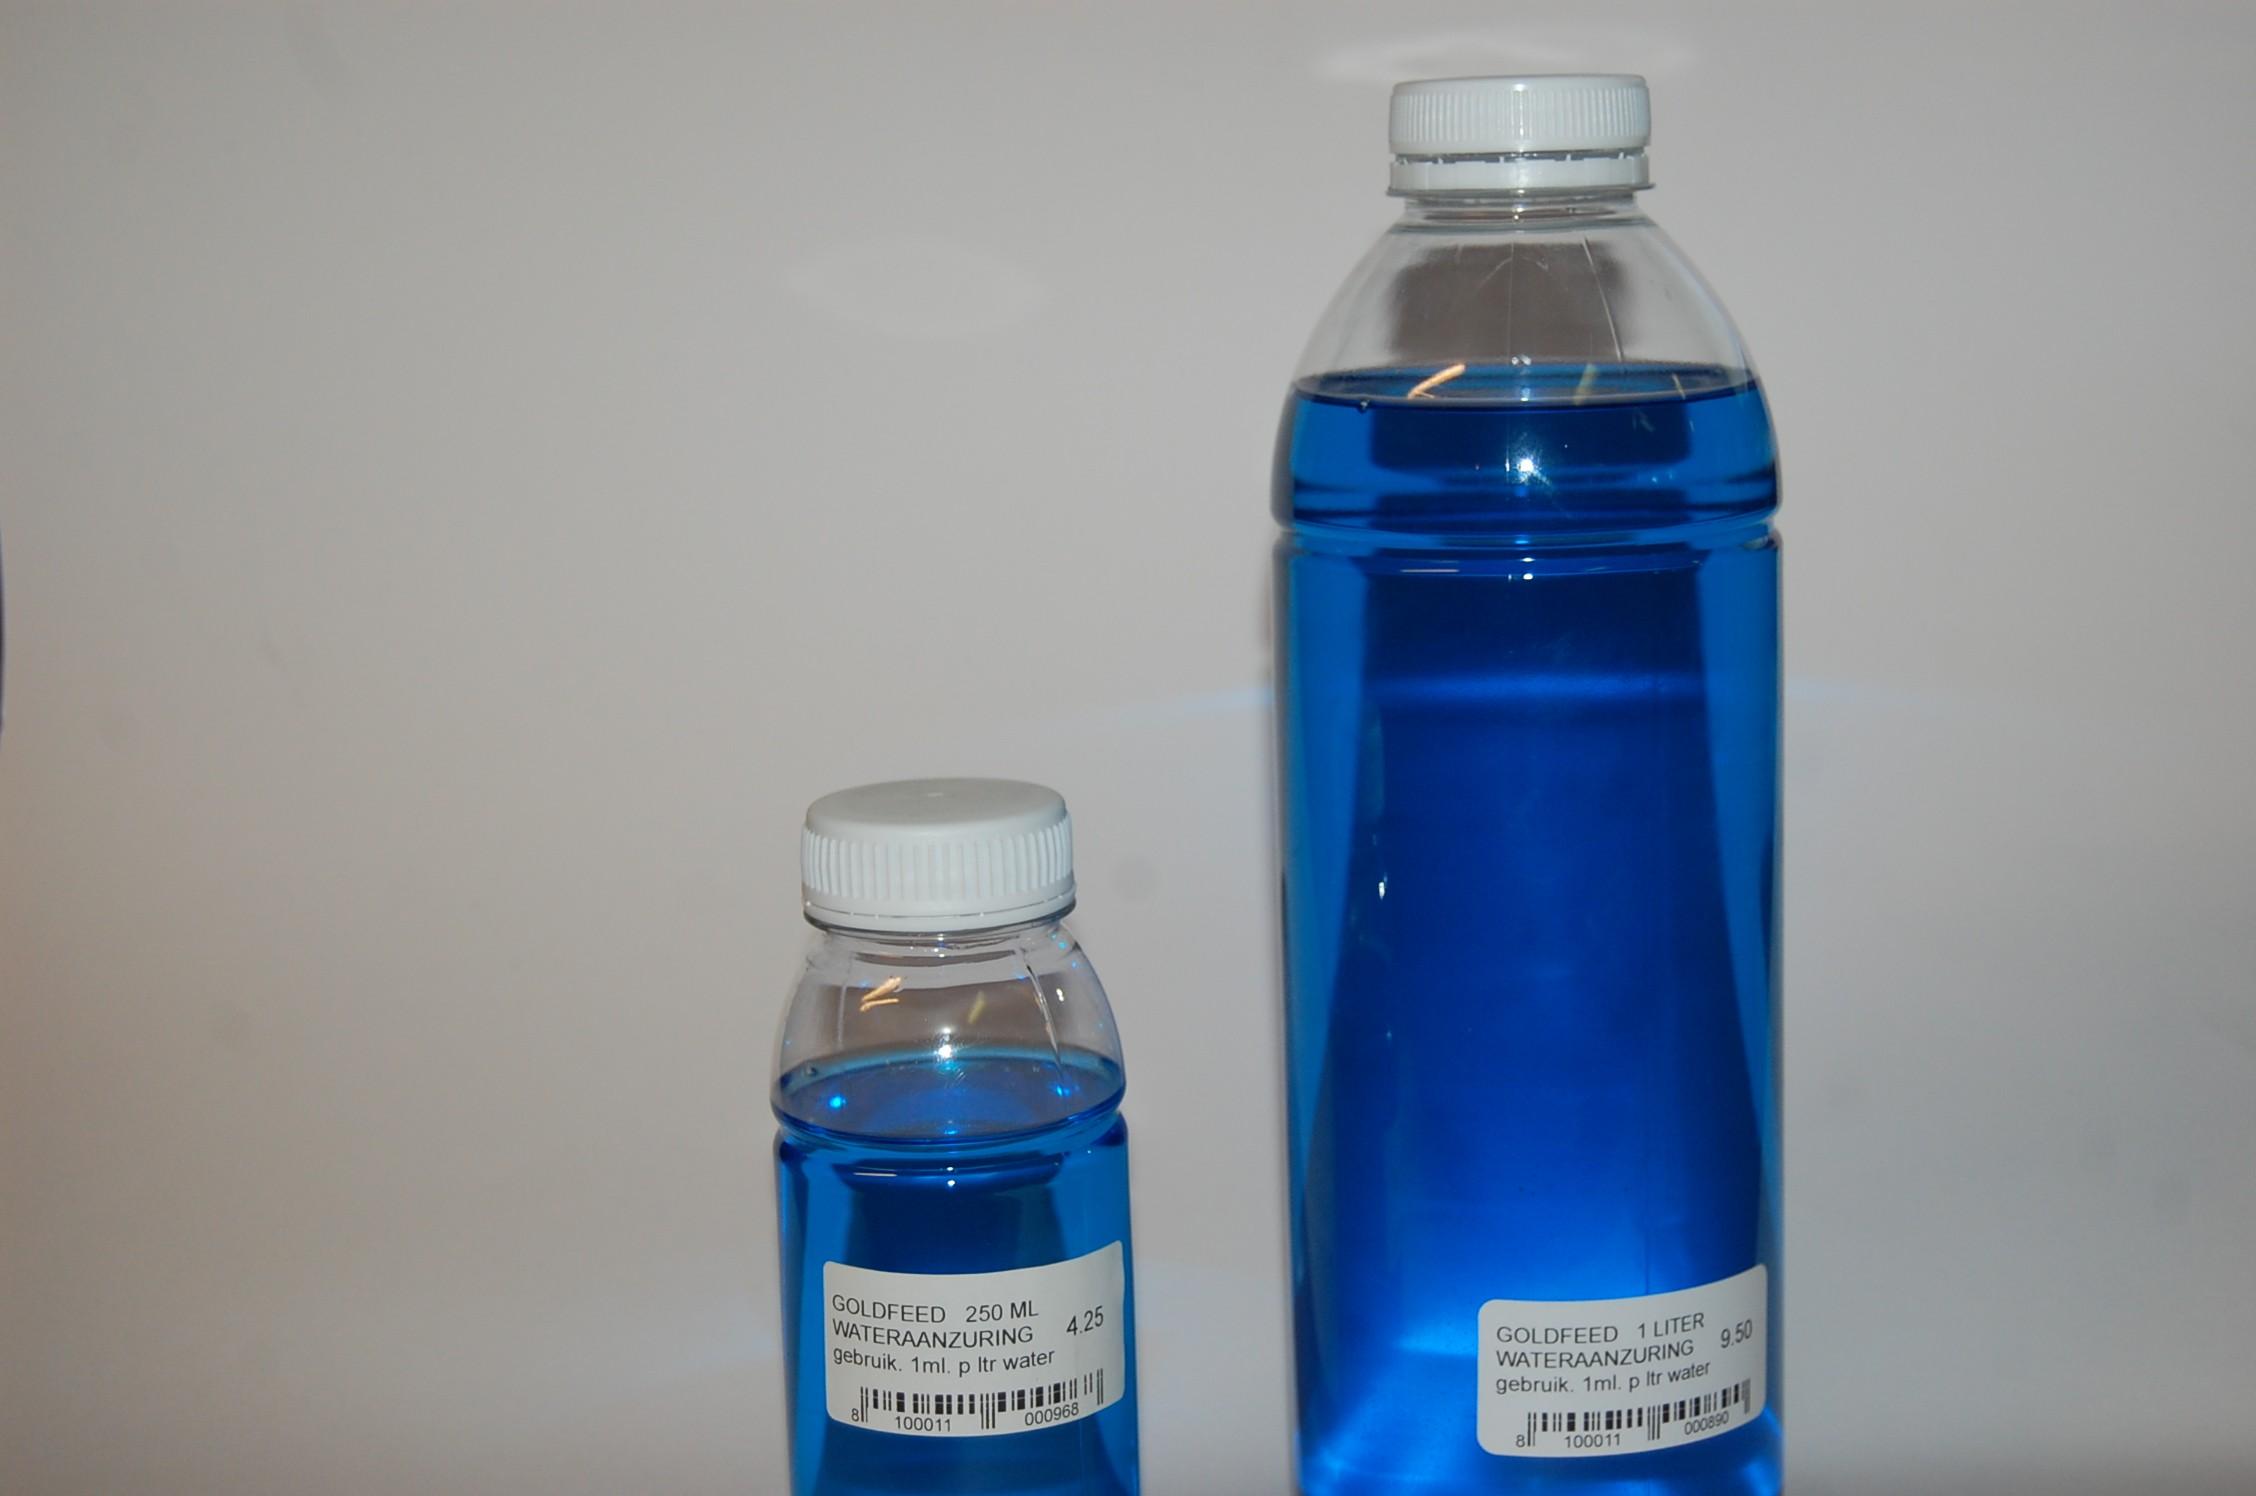 Goldfeed wateraanzuring